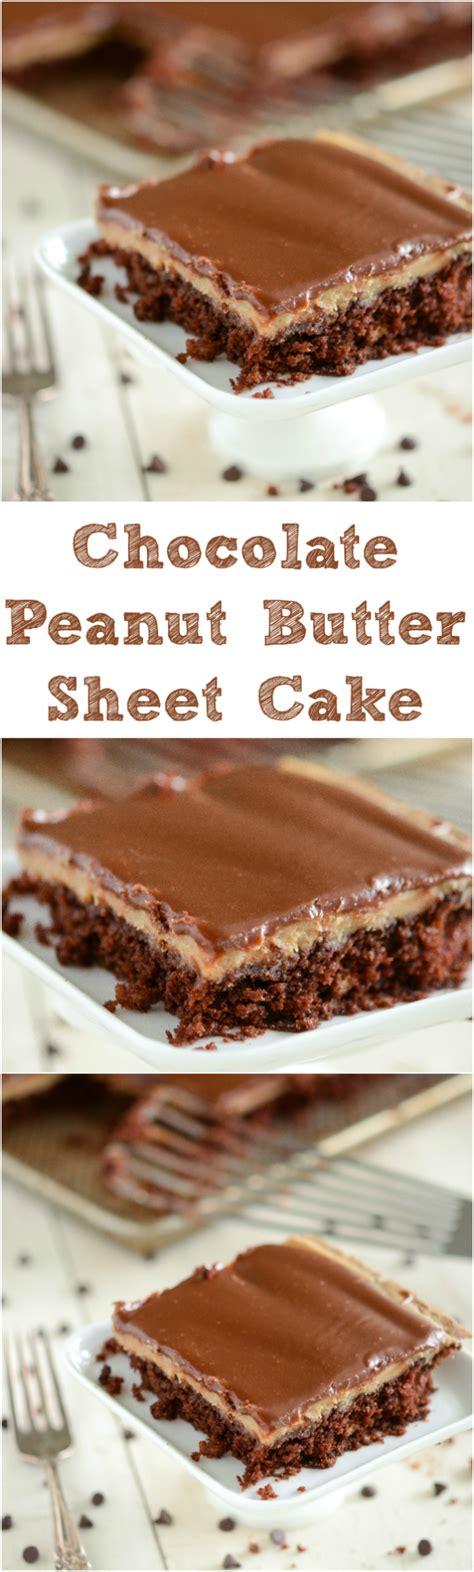 chocolate peanut butter sheet cake starts bowl moist